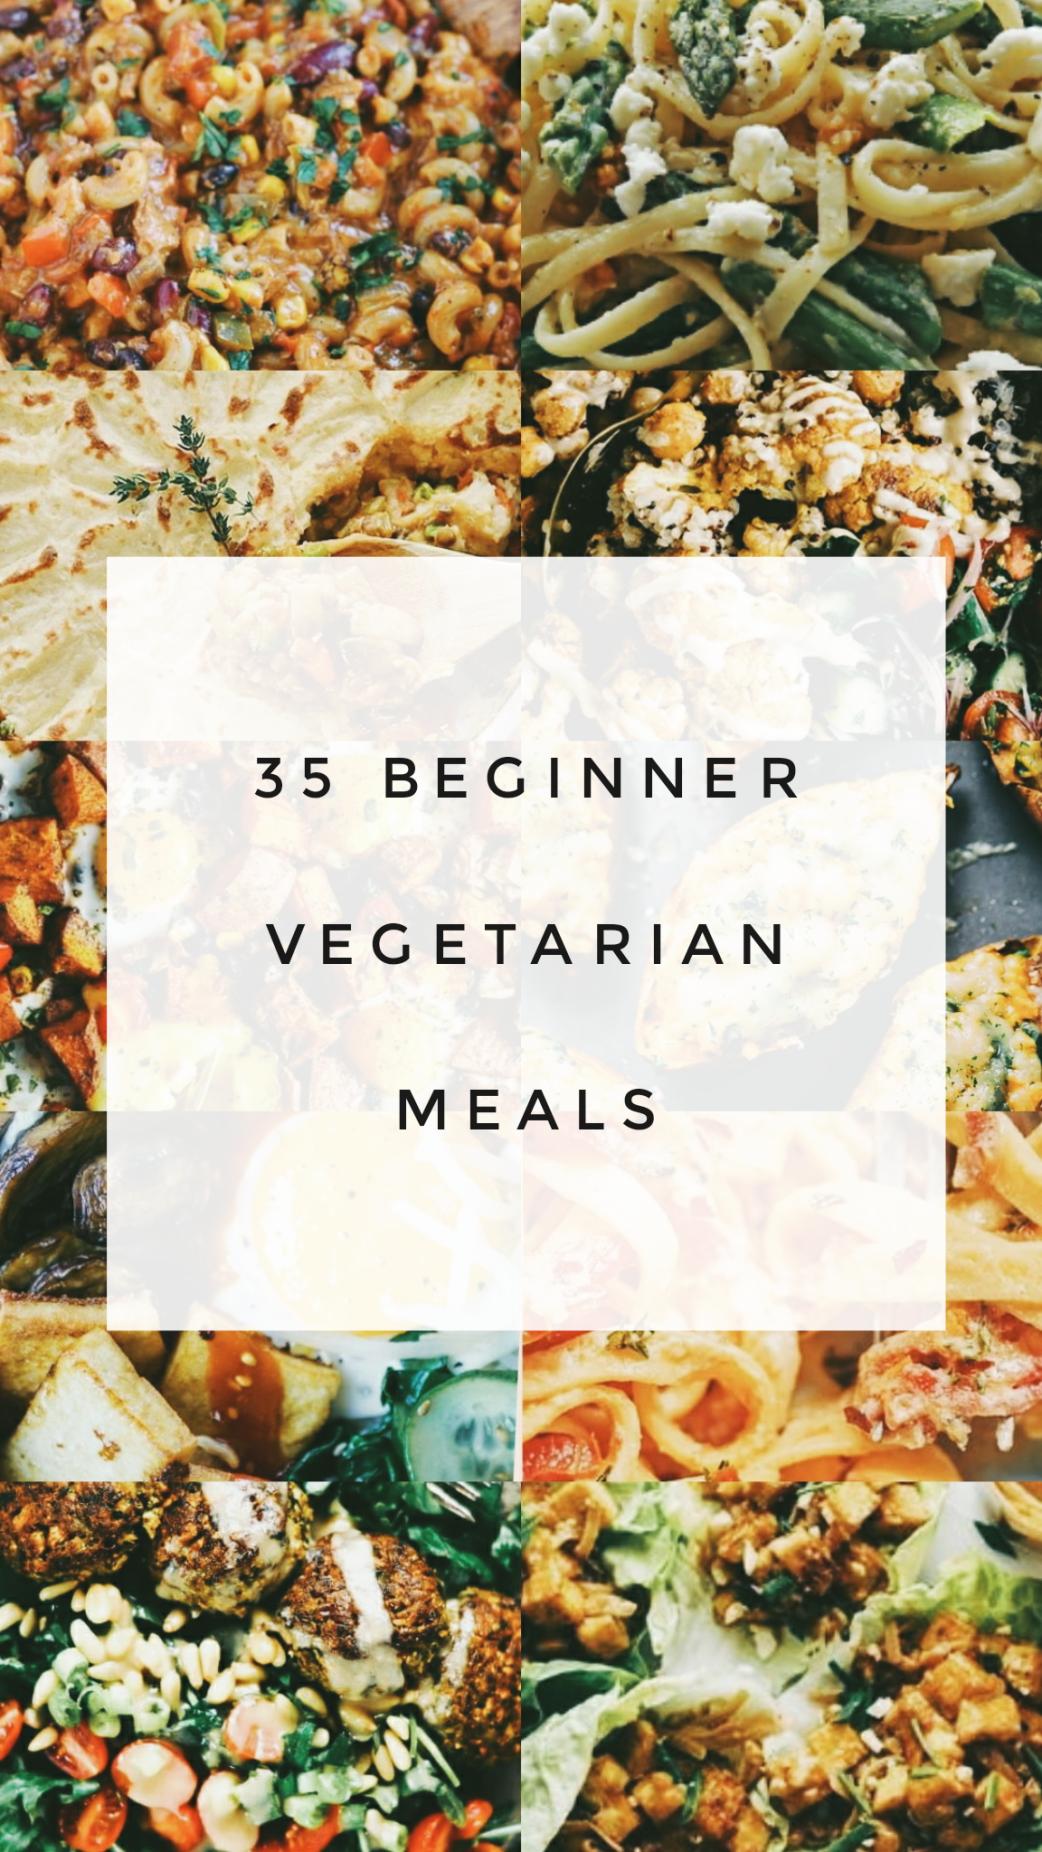 25 Beginner Vegetarian Meals: Veggie Yum | Decor Dolphin